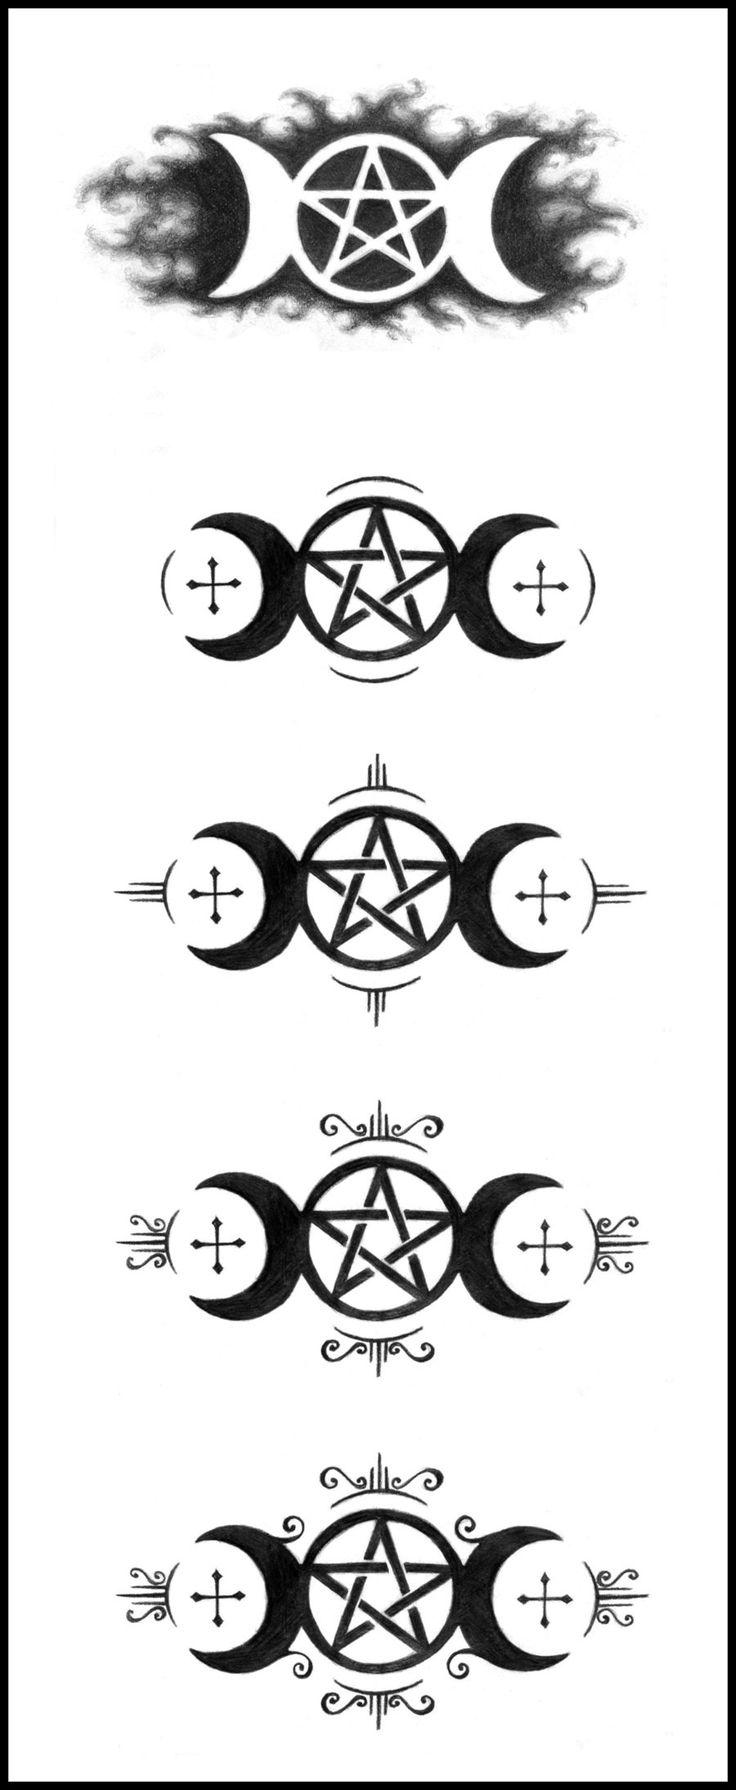 17 best images about tattoo ideas on pinterest triple goddess goddesses and symbols. Black Bedroom Furniture Sets. Home Design Ideas